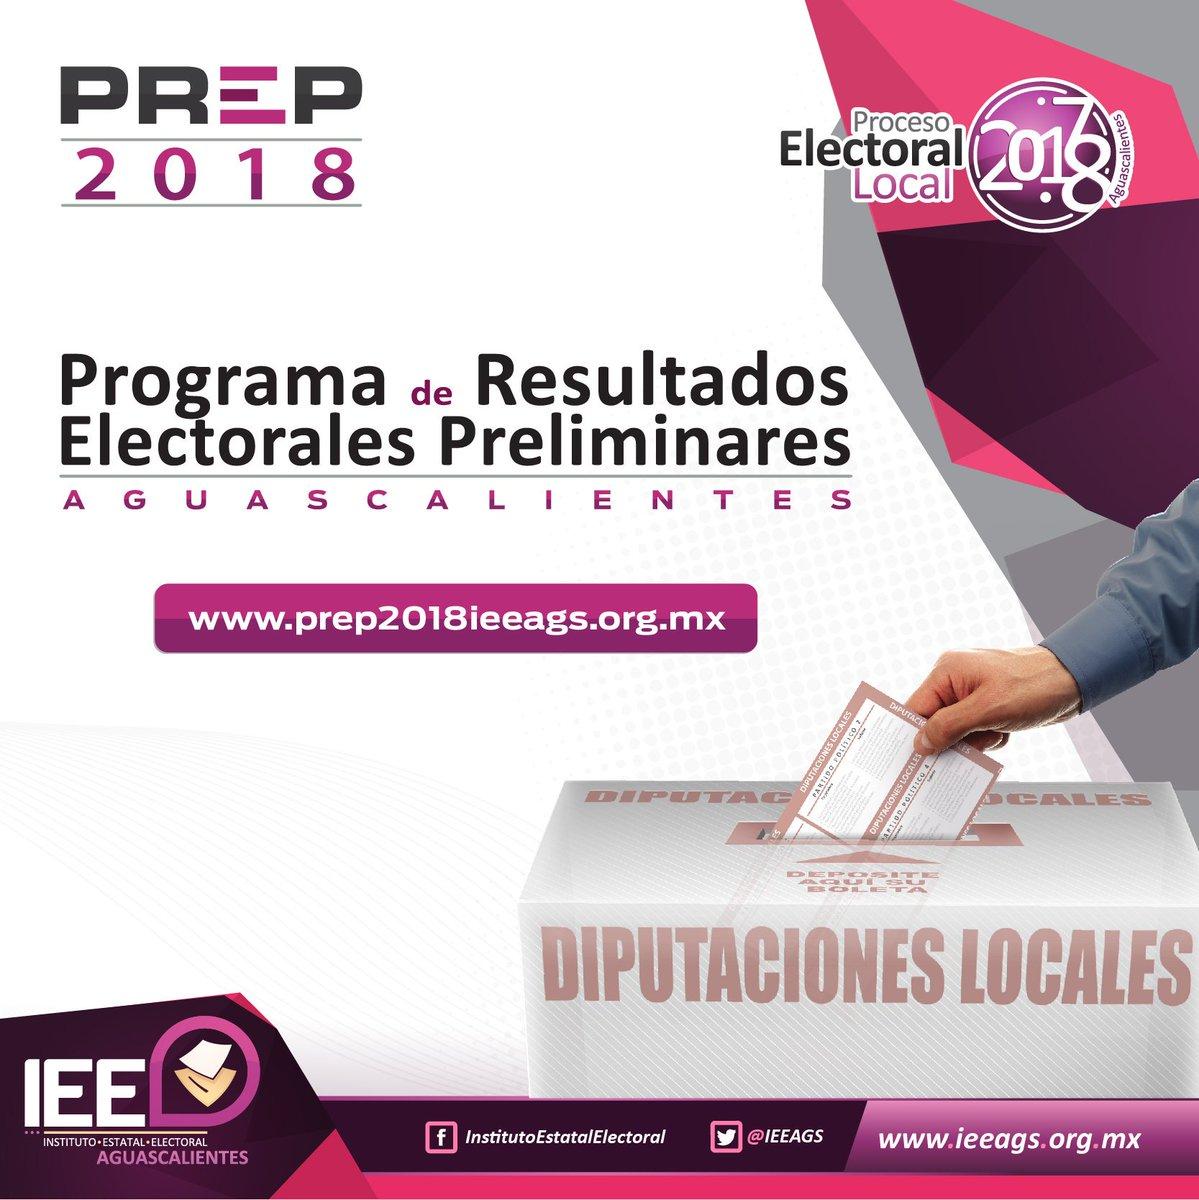 IEE Aguascalientes on Twitter: